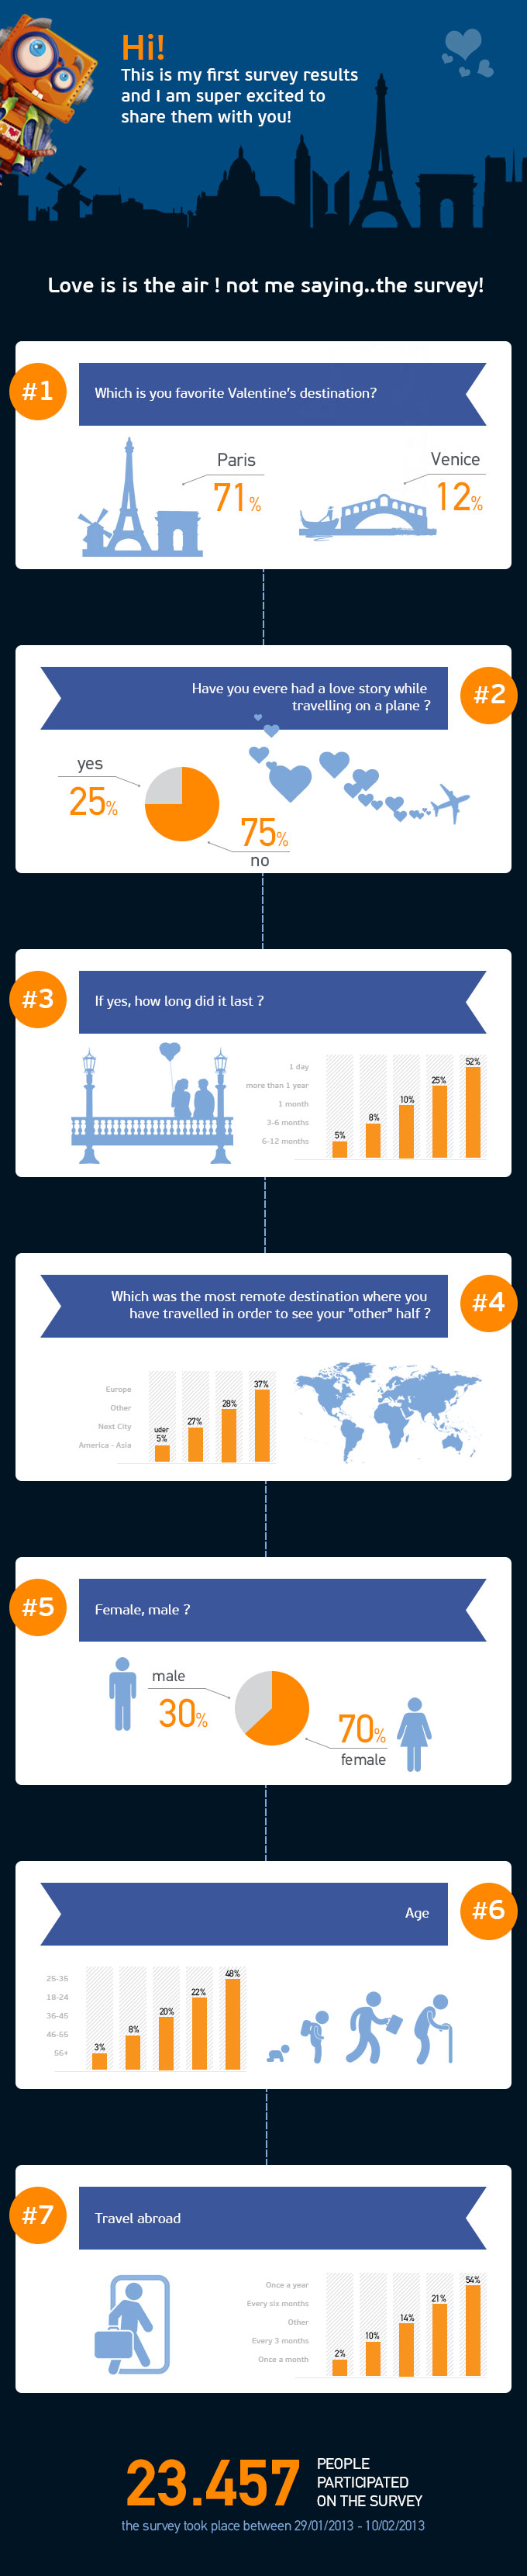 Greeks Travel Habits-Infographic